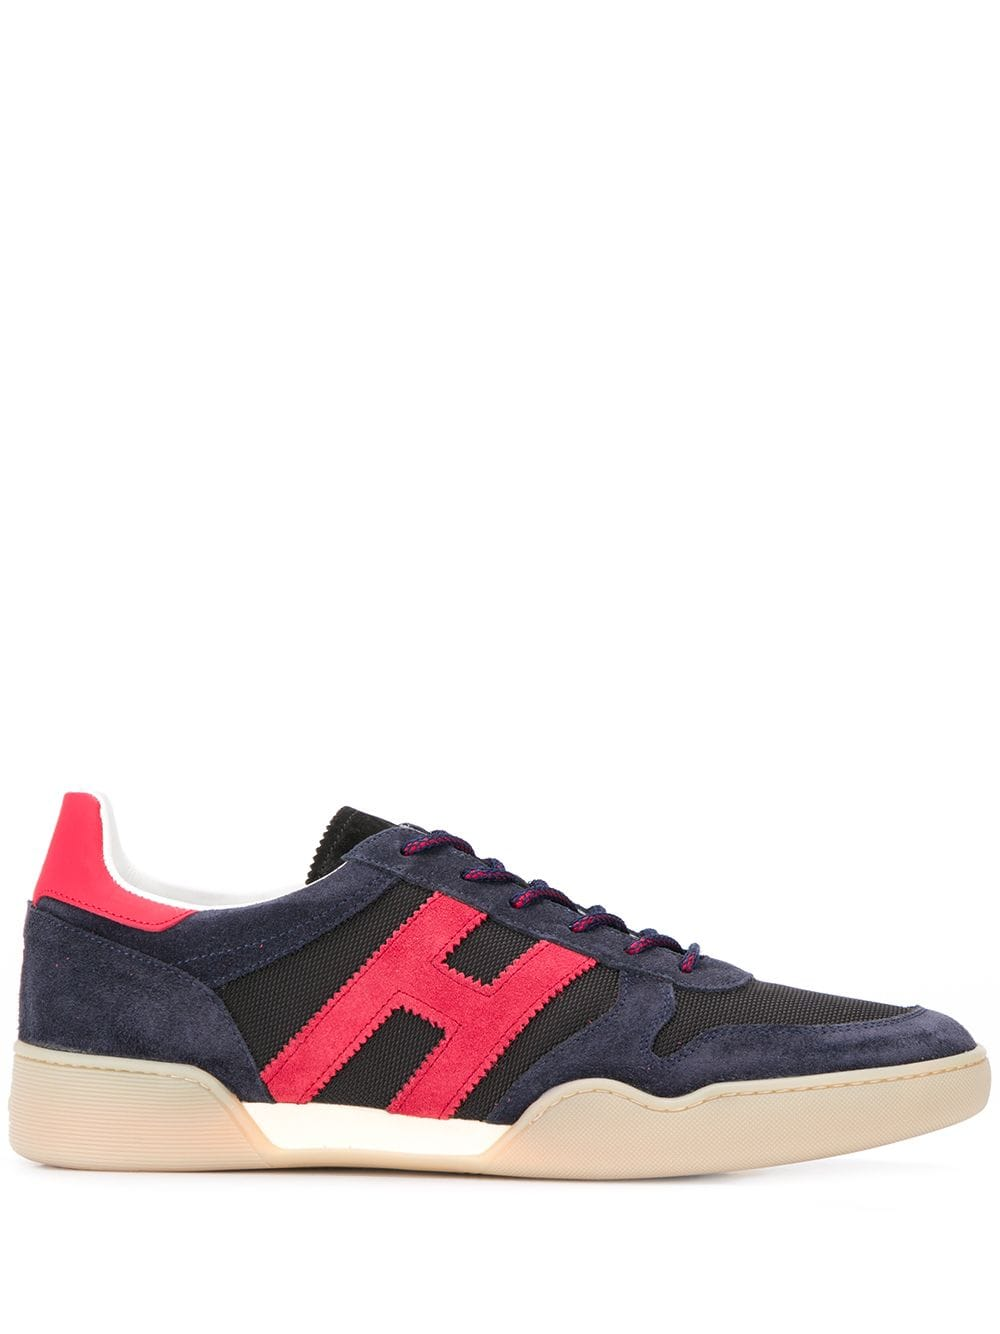 H357 Sneakers